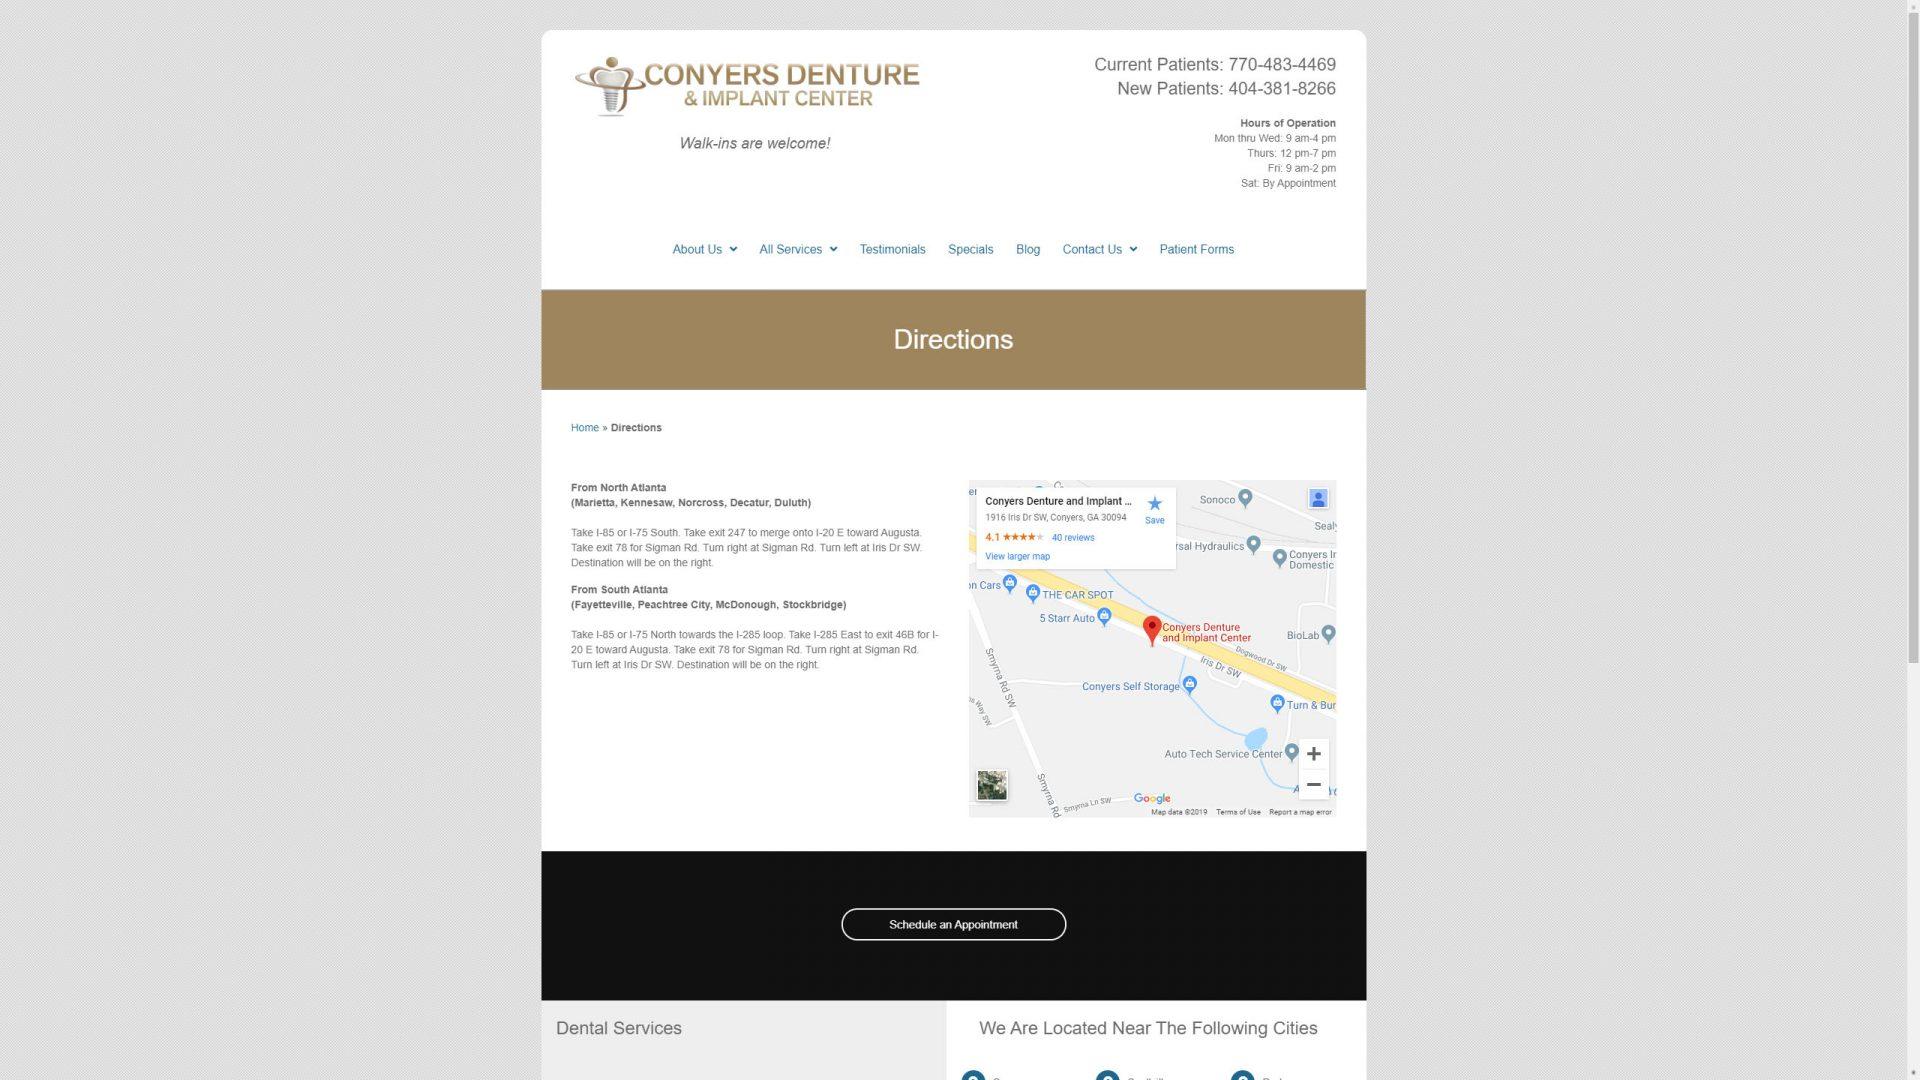 Conyers Denture & Implant Center Desktop Web Design